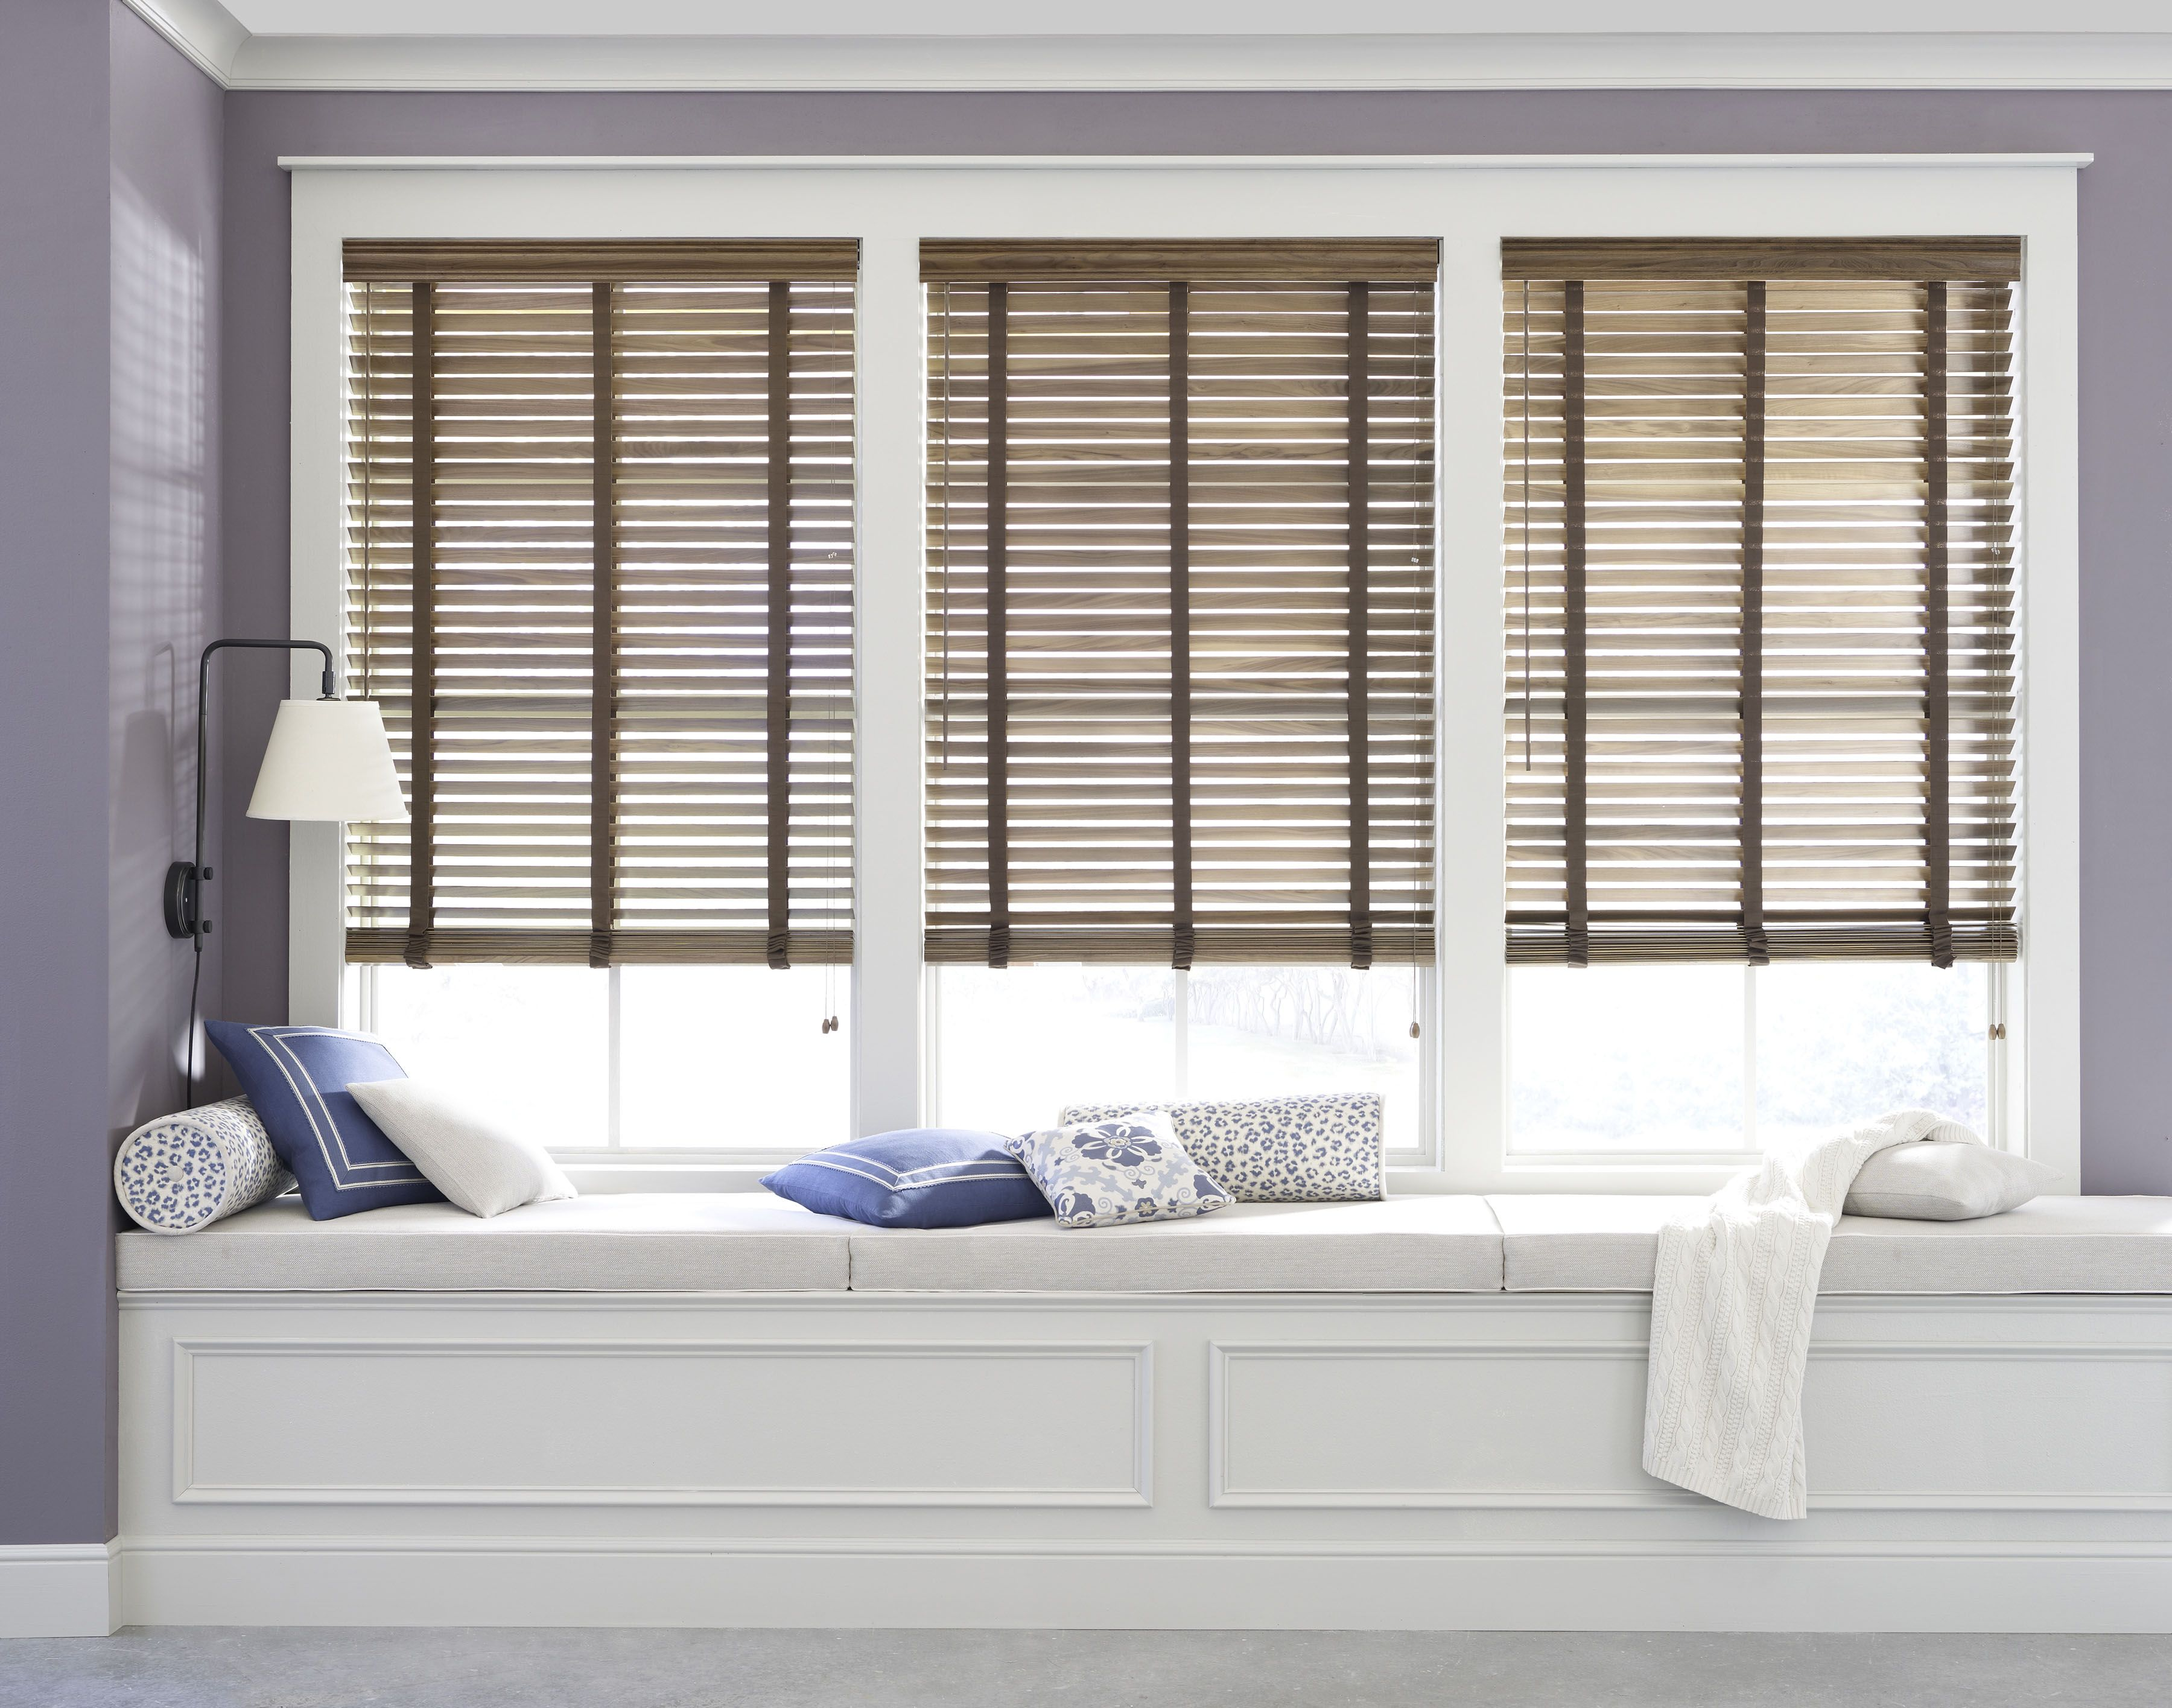 Window treatment ideas for a sunroom  custom window treatments wood blinds  marthaus road marthaus